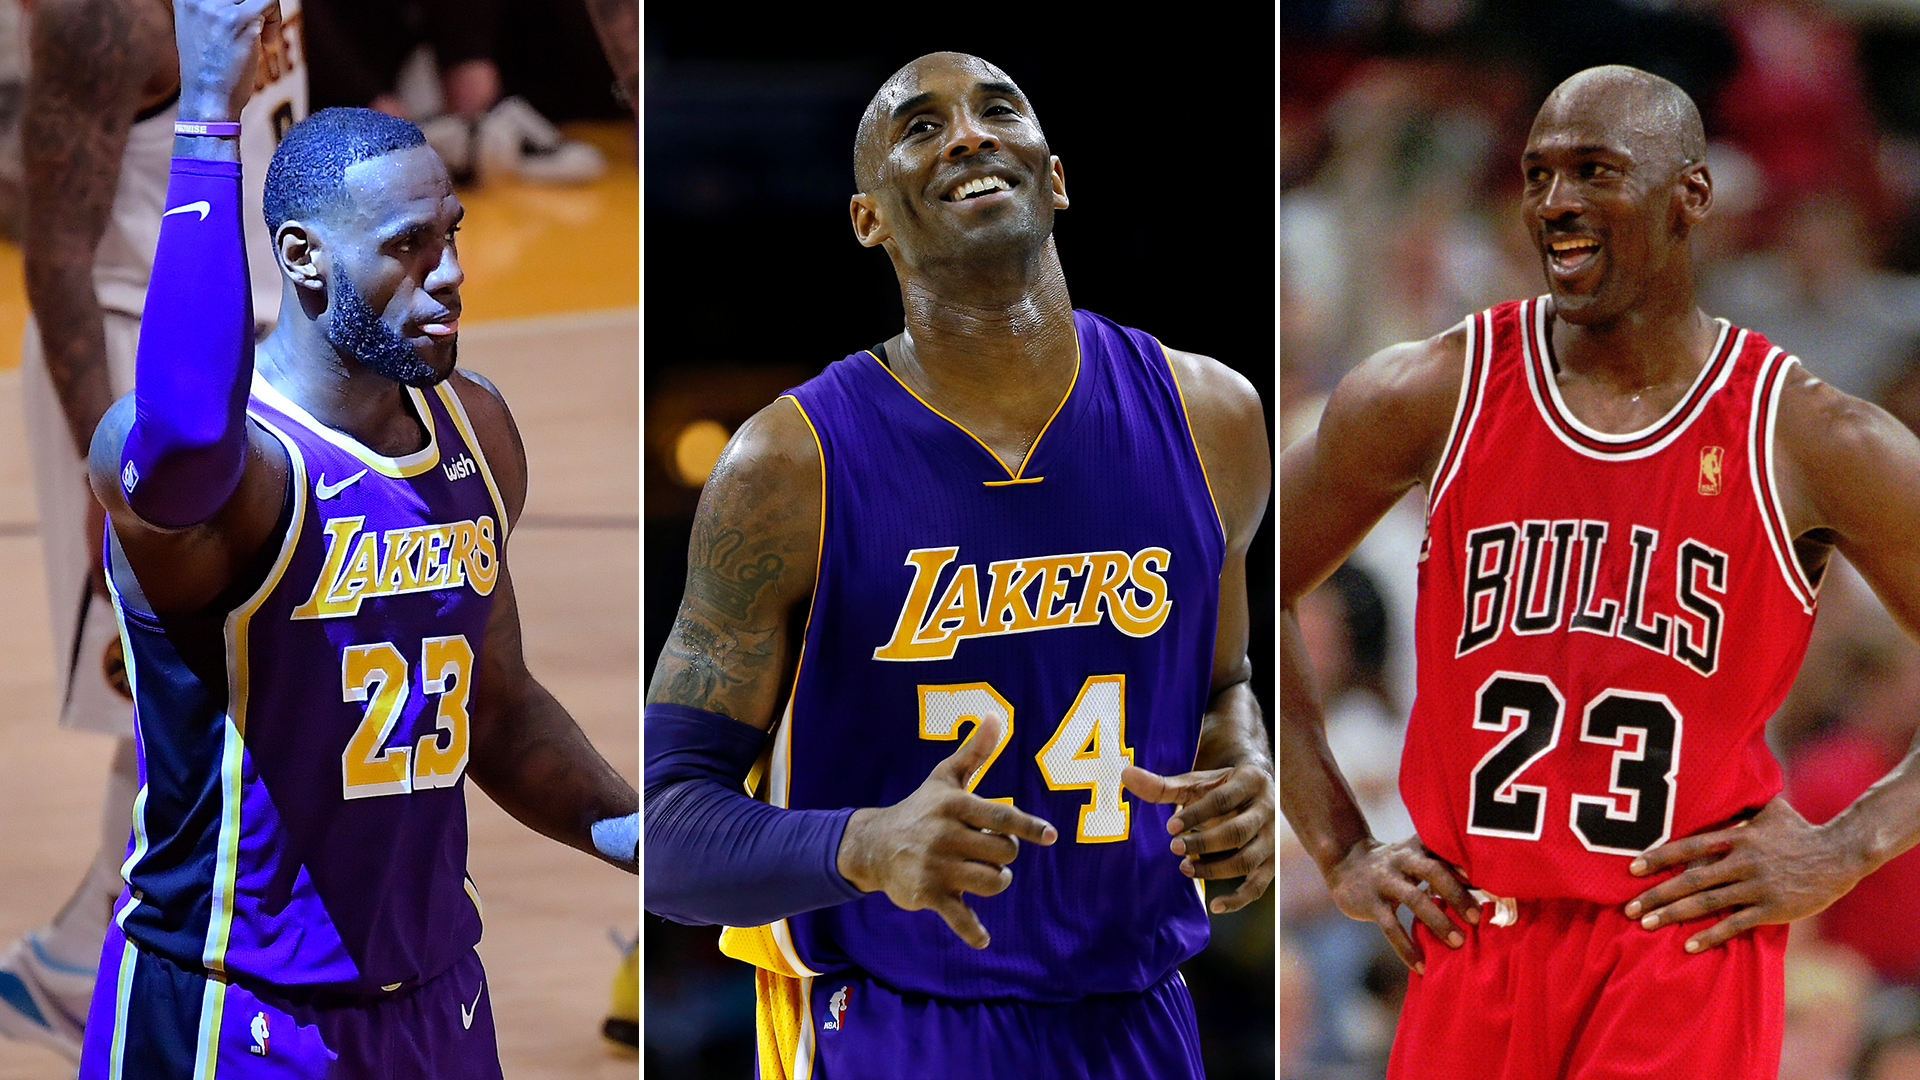 Lebron James Kobe Bryant Michael Jordan 1920x1080 Download Hd Wallpaper Wallpapertip